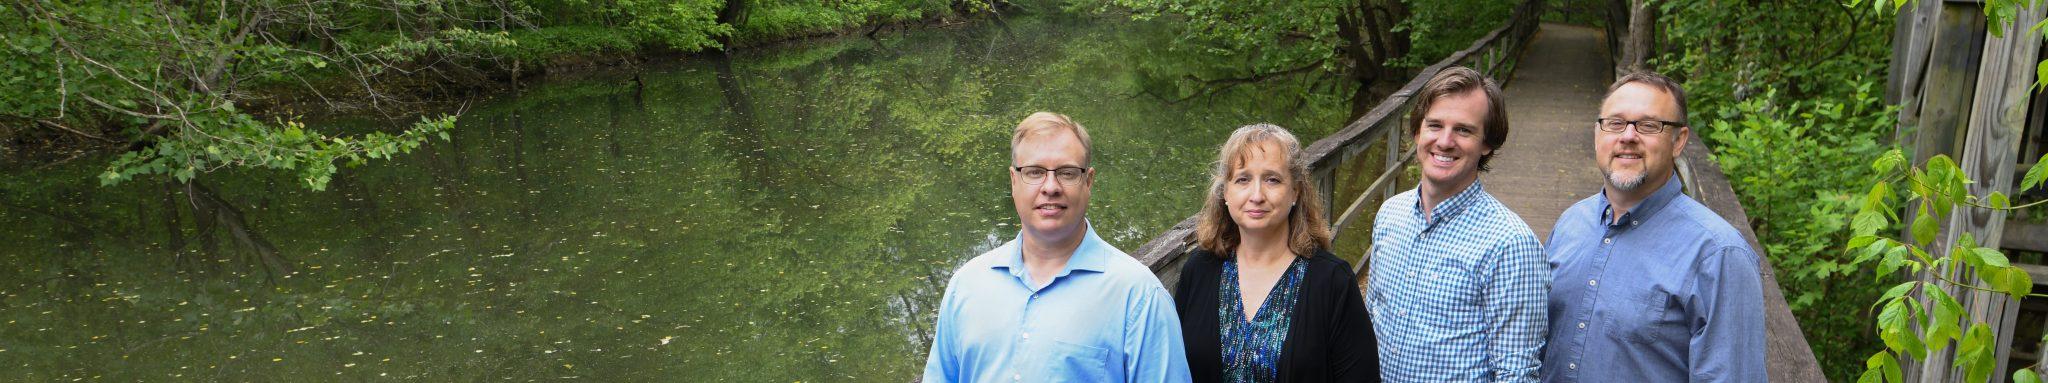 Hickory Land Planning Team